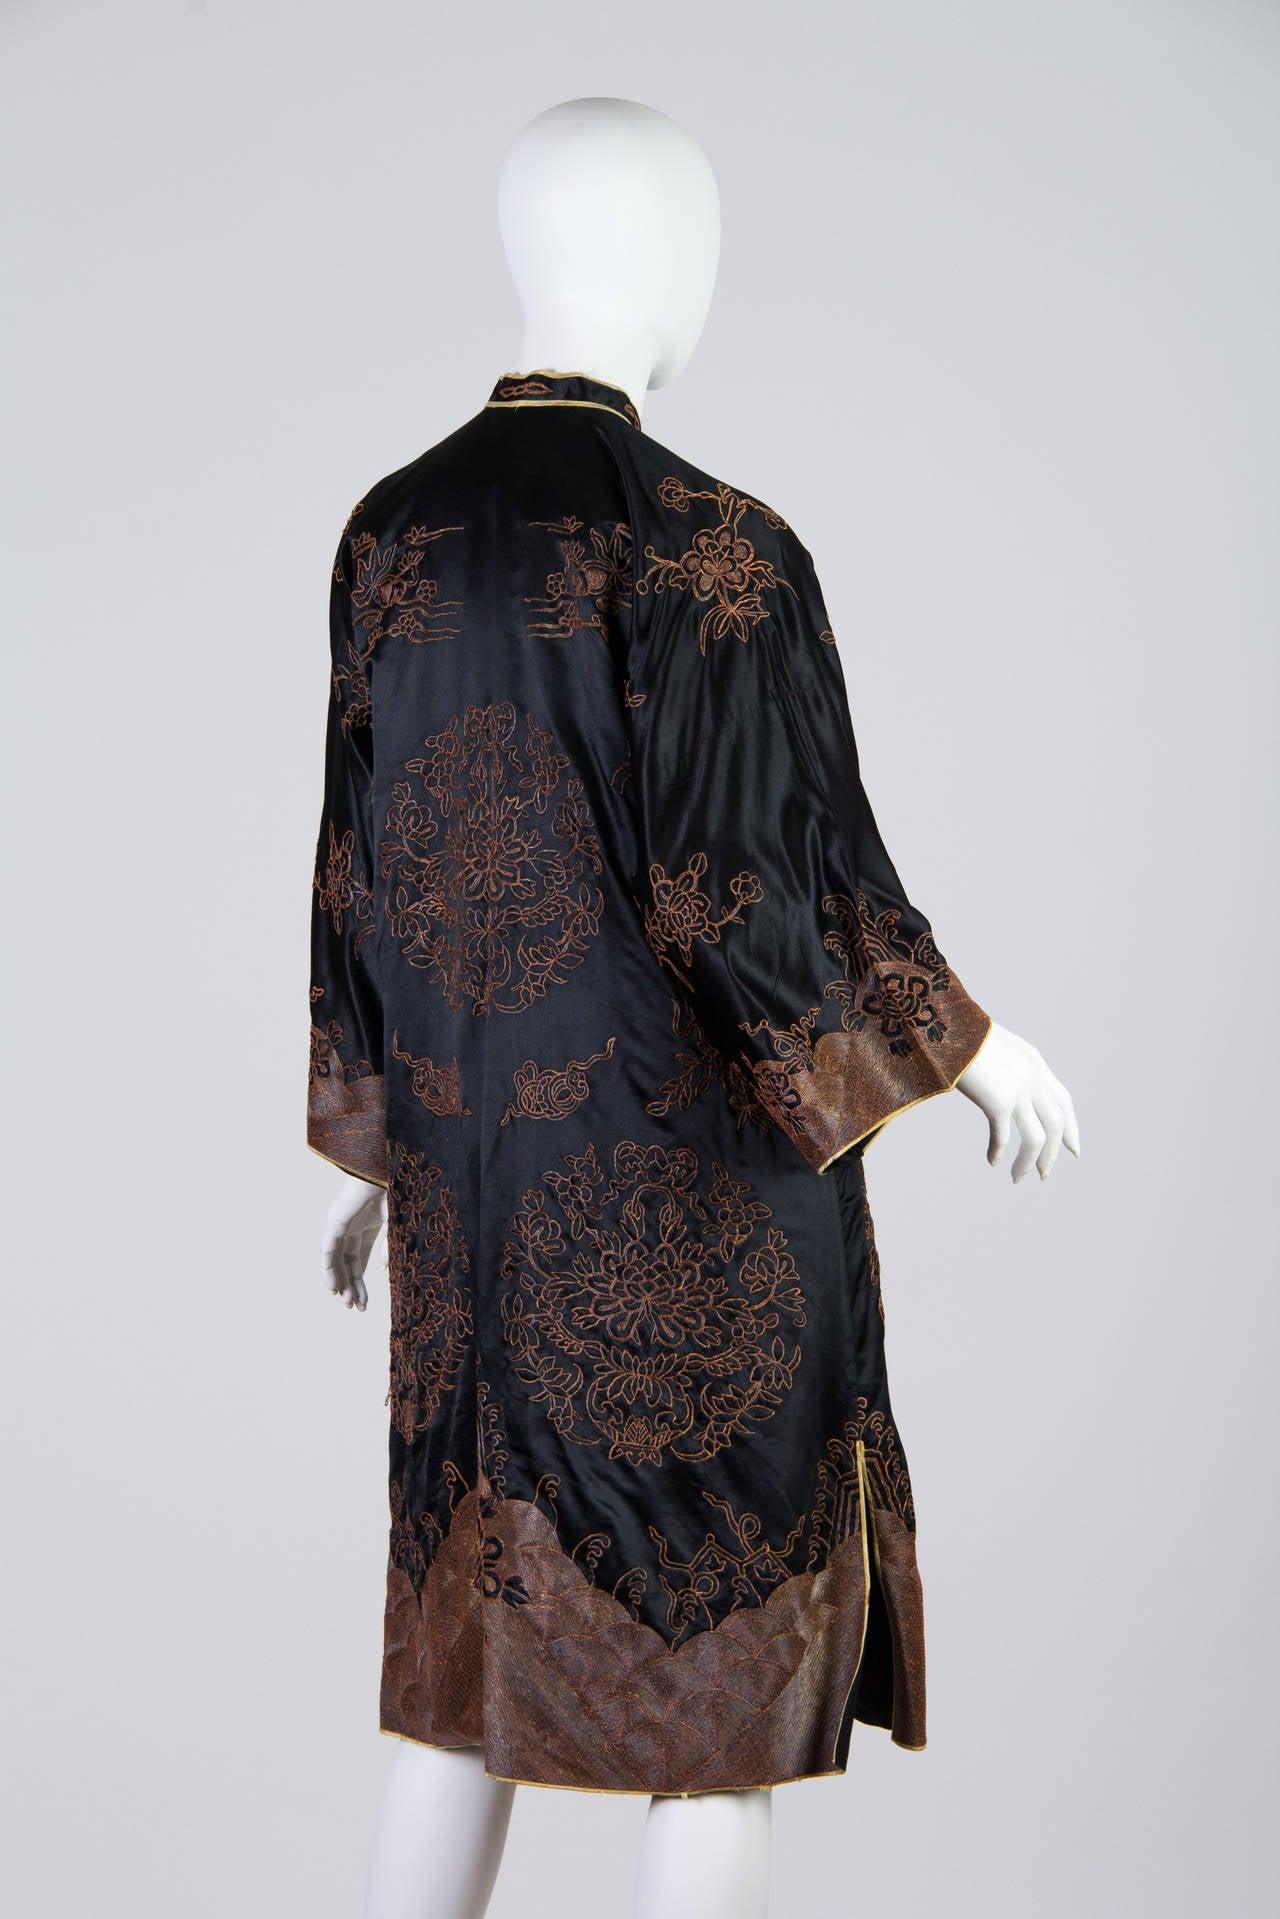 Early Chinese Embroidered Jacket Kimono style 2